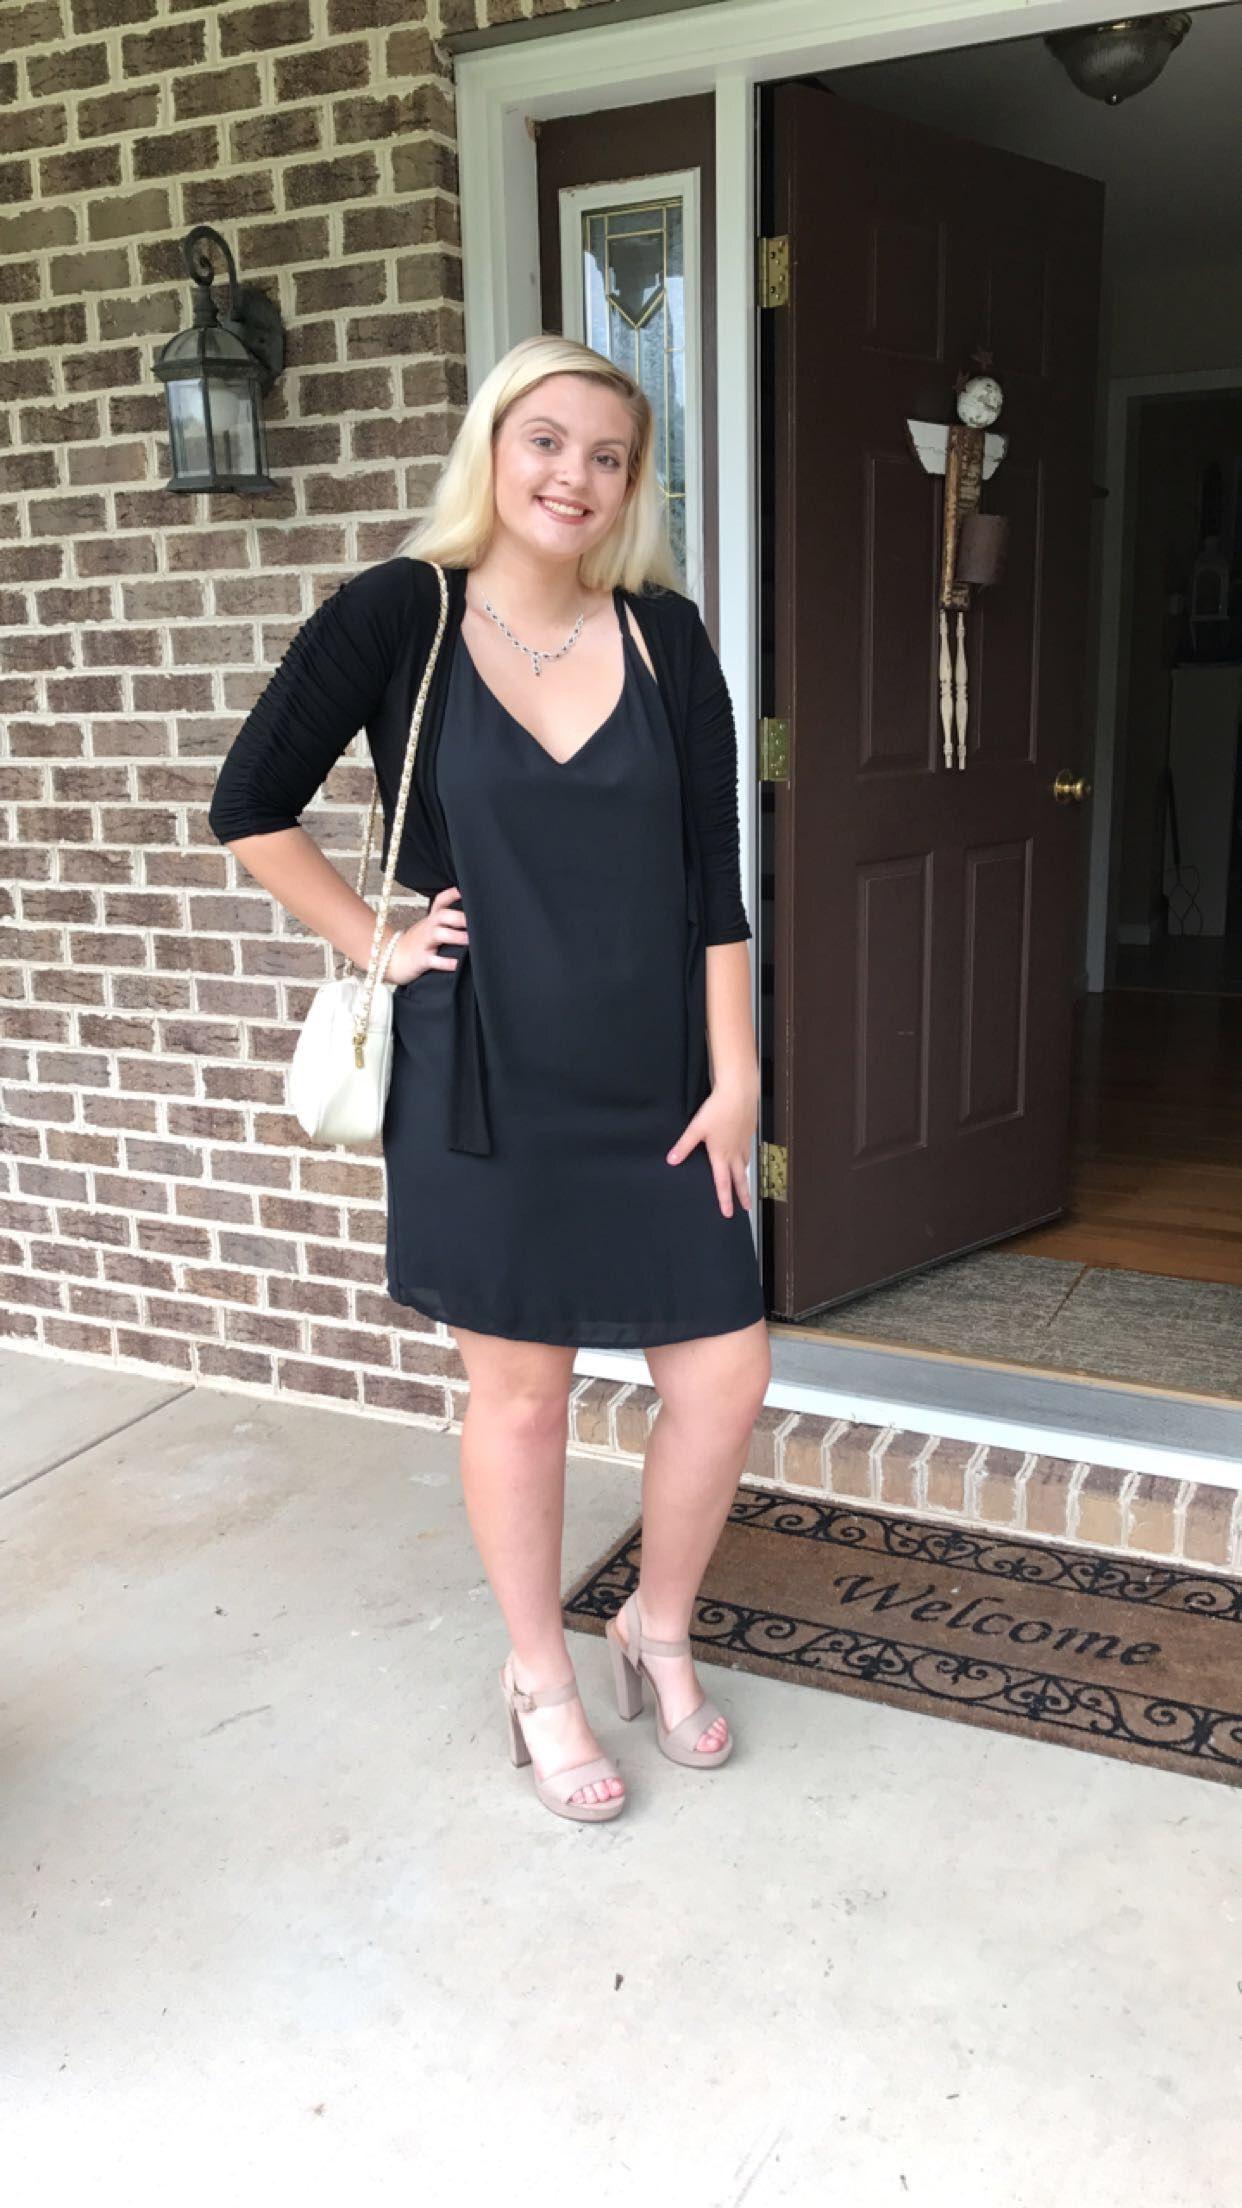 Black Fashion Outfits Love Art Style Clothes Dress Black White Heels Girlfashion Blonde Outside Outfits Seniory Fashion Outfits Girl Fashion [ 2208 x 1242 Pixel ]